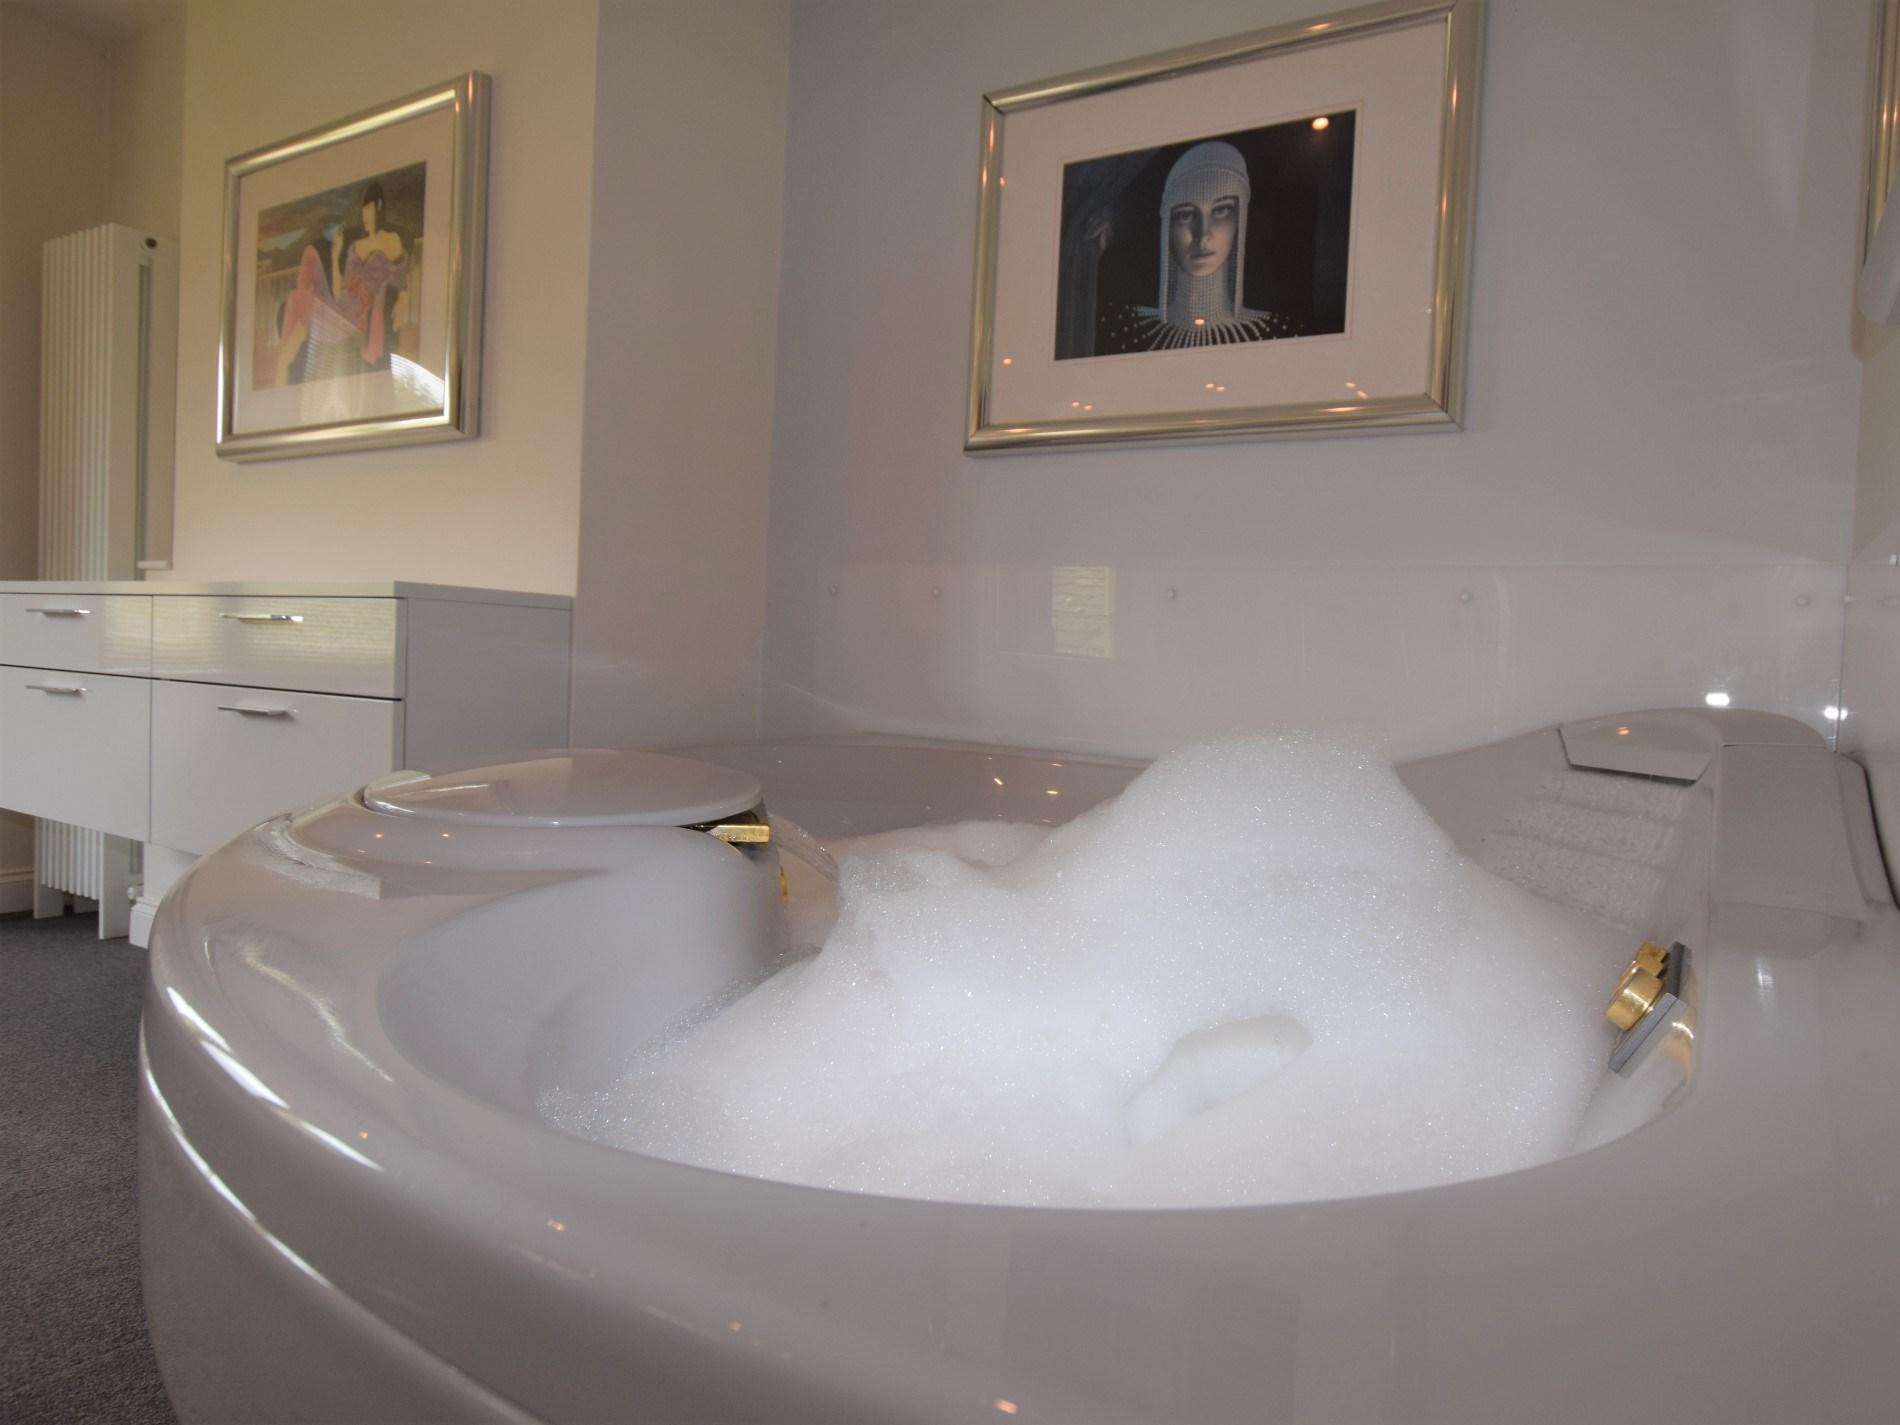 Take a long soak in the large spa bath